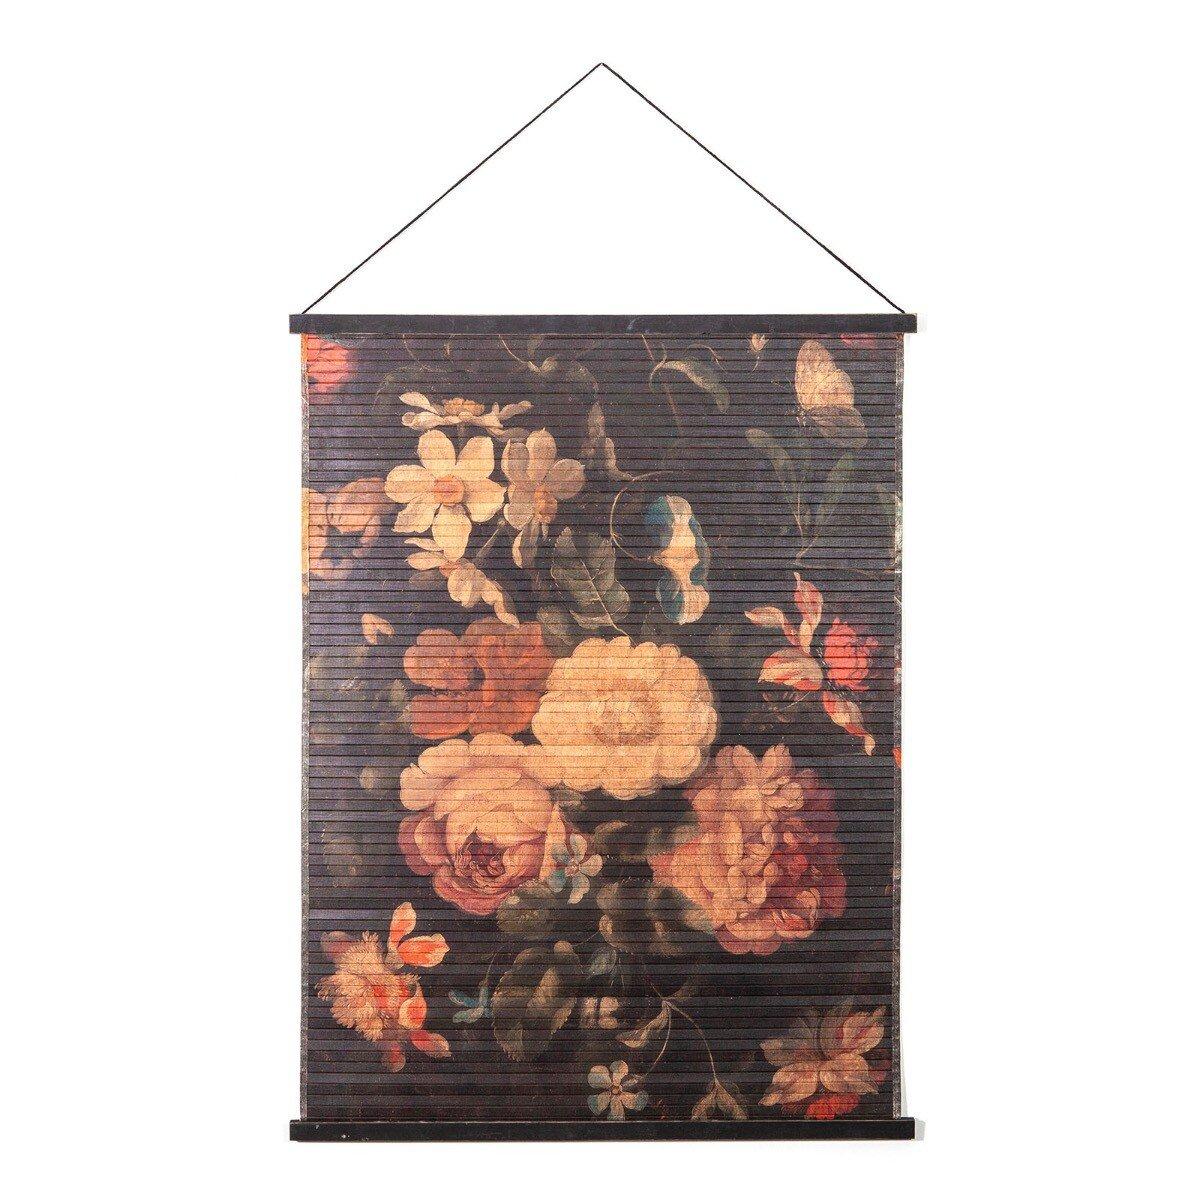 By Boo wandkleed miyagi flowers l 120 x 90 x 2